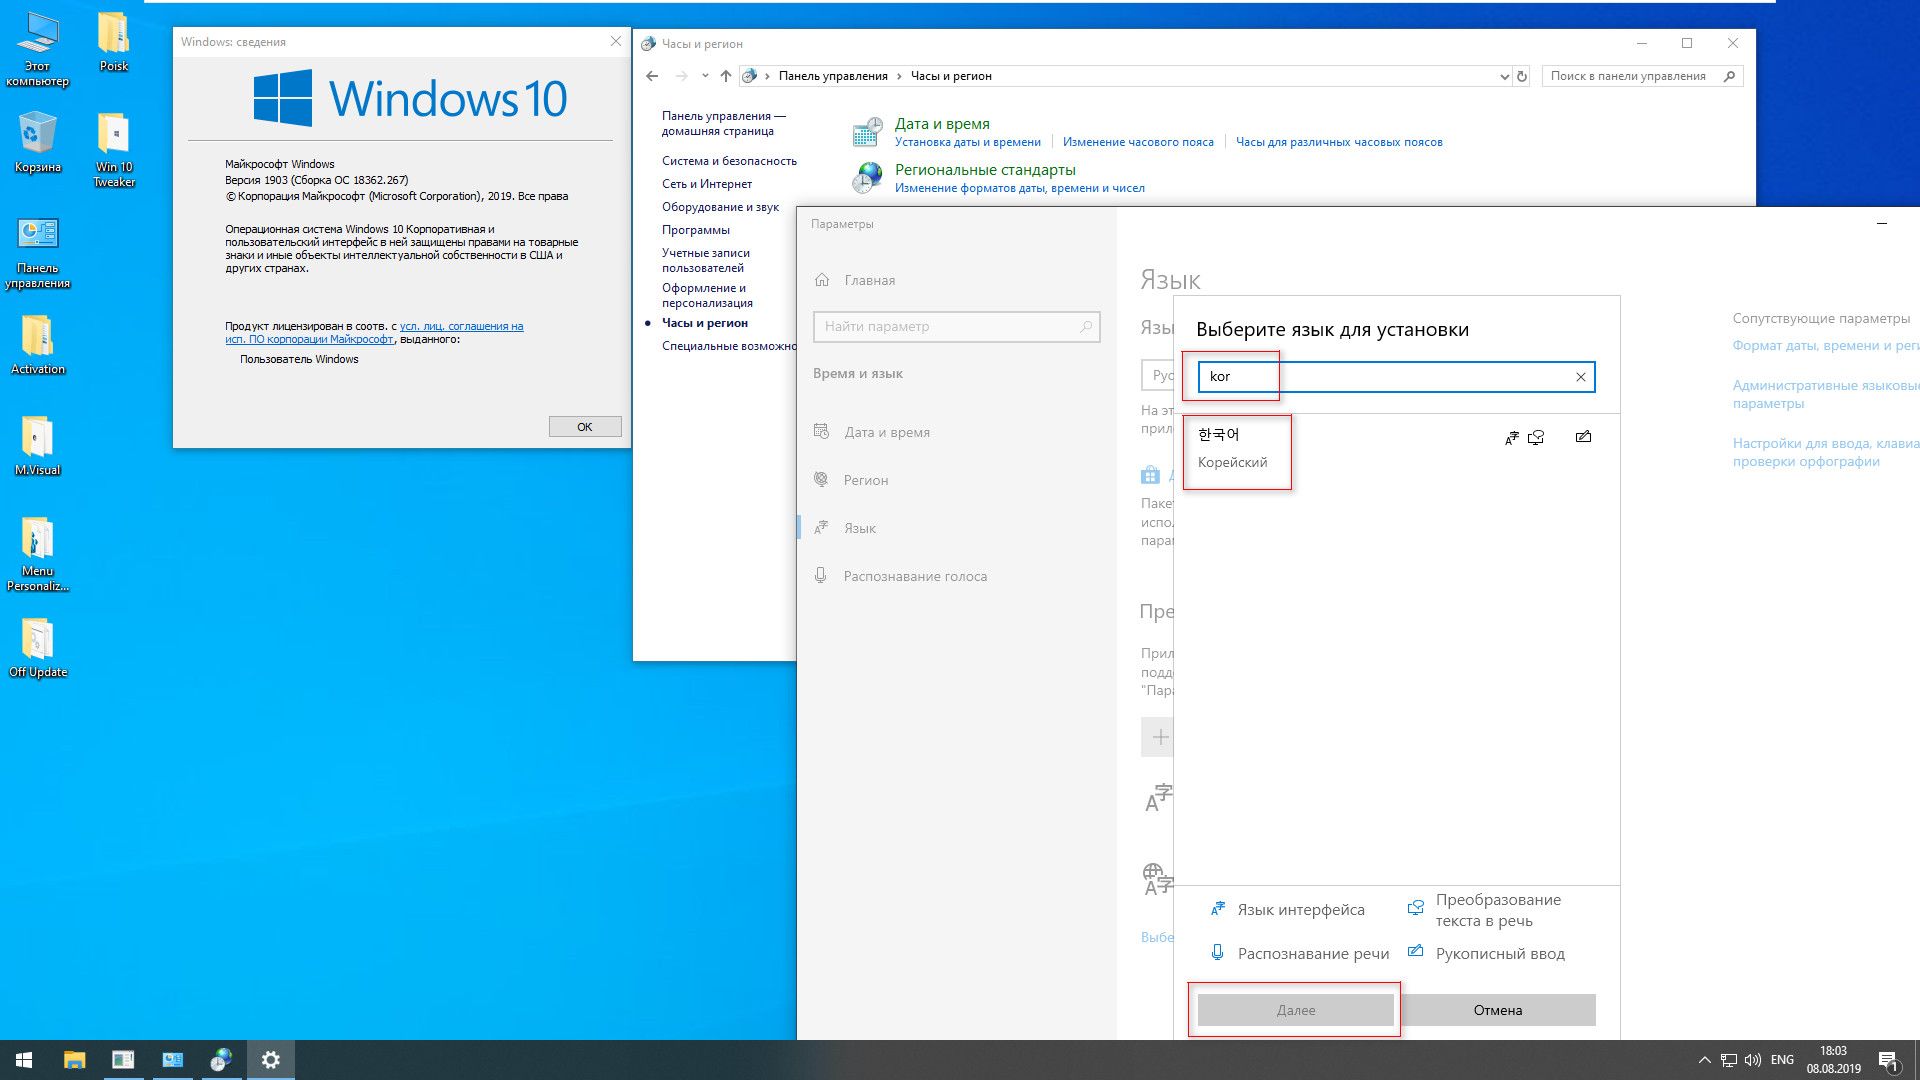 Windows 10 Enterprise x64 lite 1903 build 18362.267 by Zosma.iso - 러시아어 한글화 시도 - 그래서 그냥 원본대로 설치 후에 한글화 시도 2019-08-09_000318.jpg